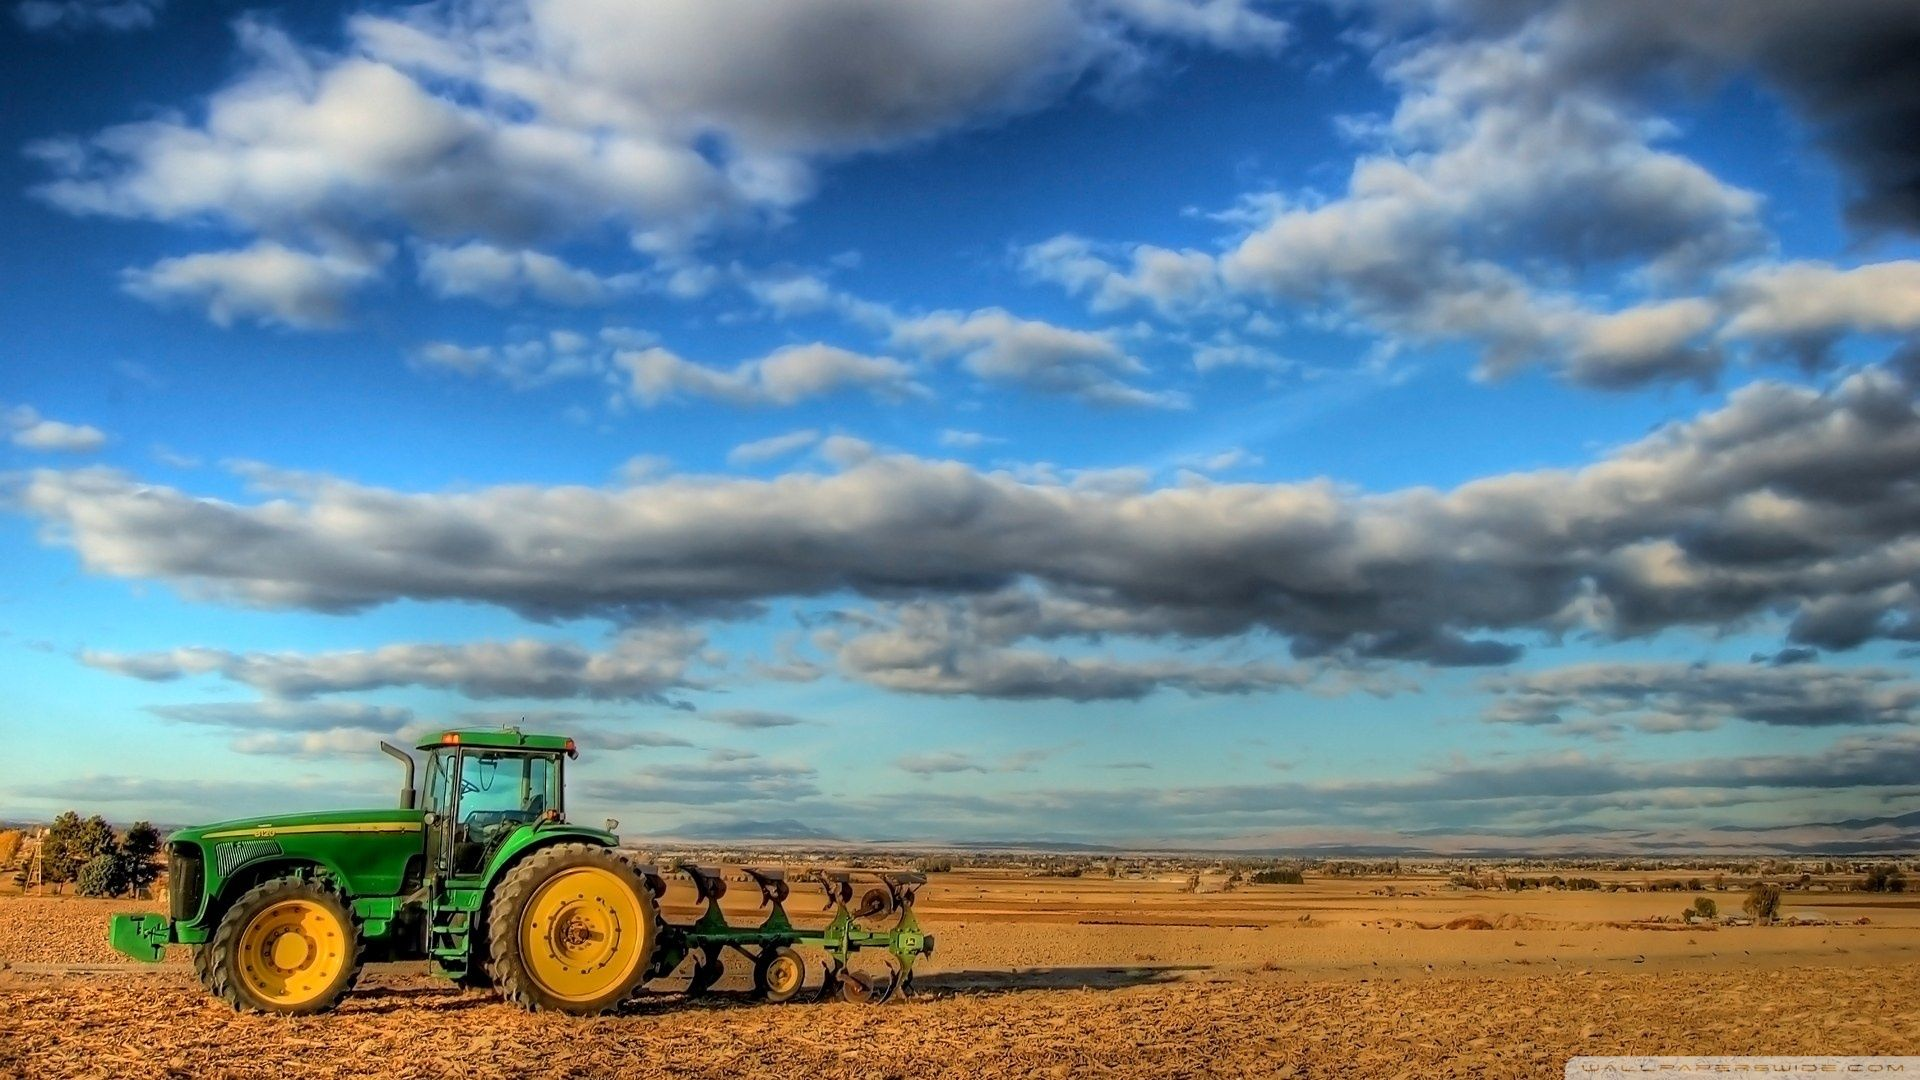 Hd John Deere Tractor In Big Sky Country Wallpaper Download Free